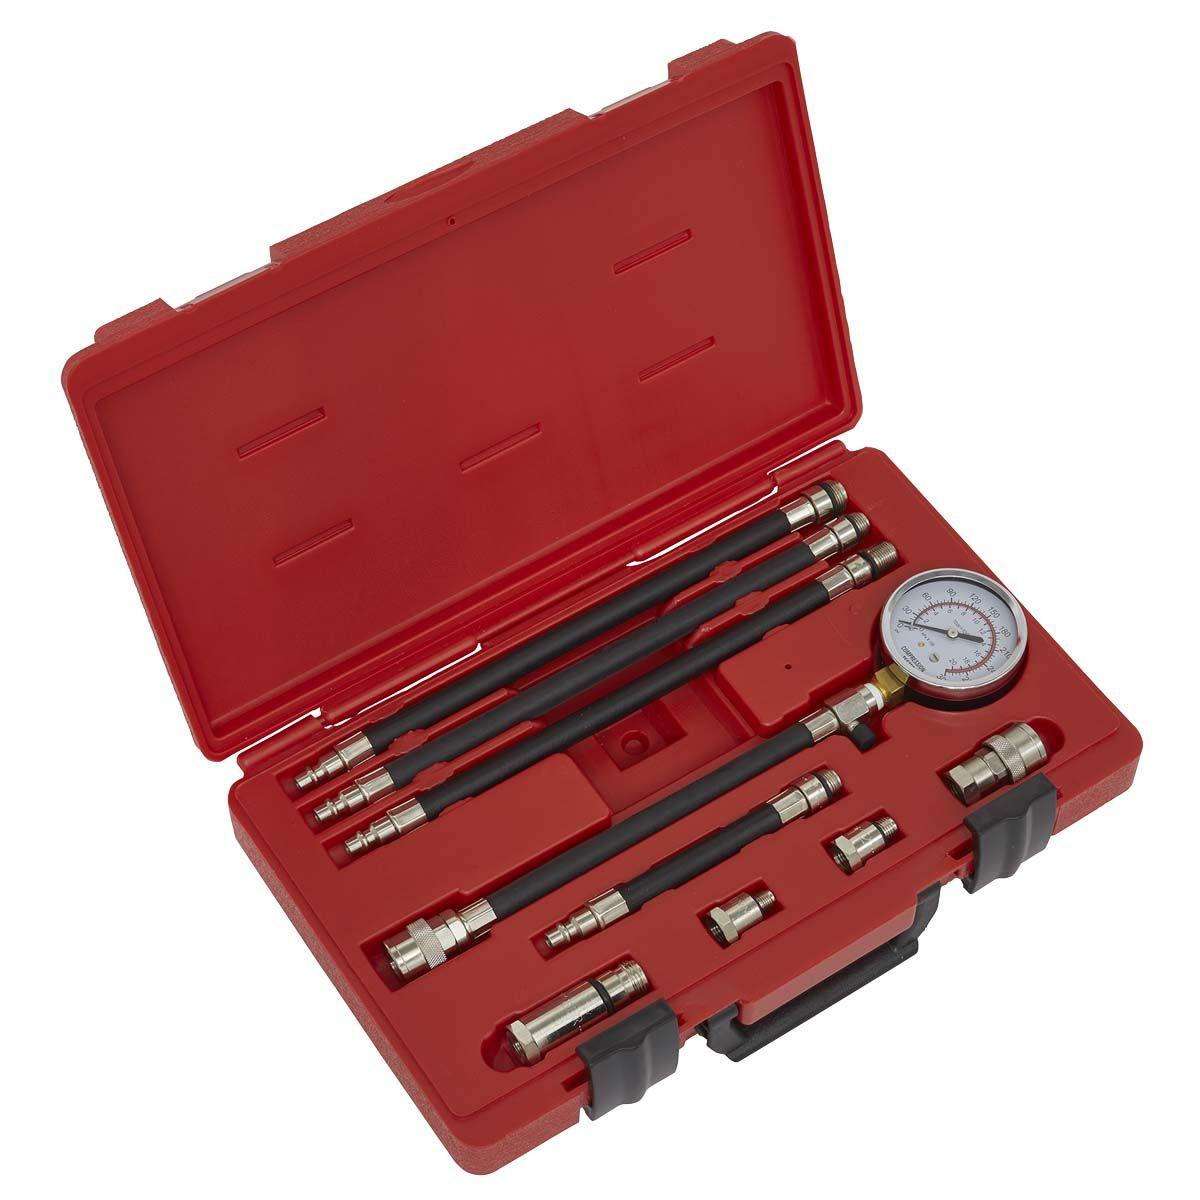 Sealey Petrol Compression Test Kit 10pc